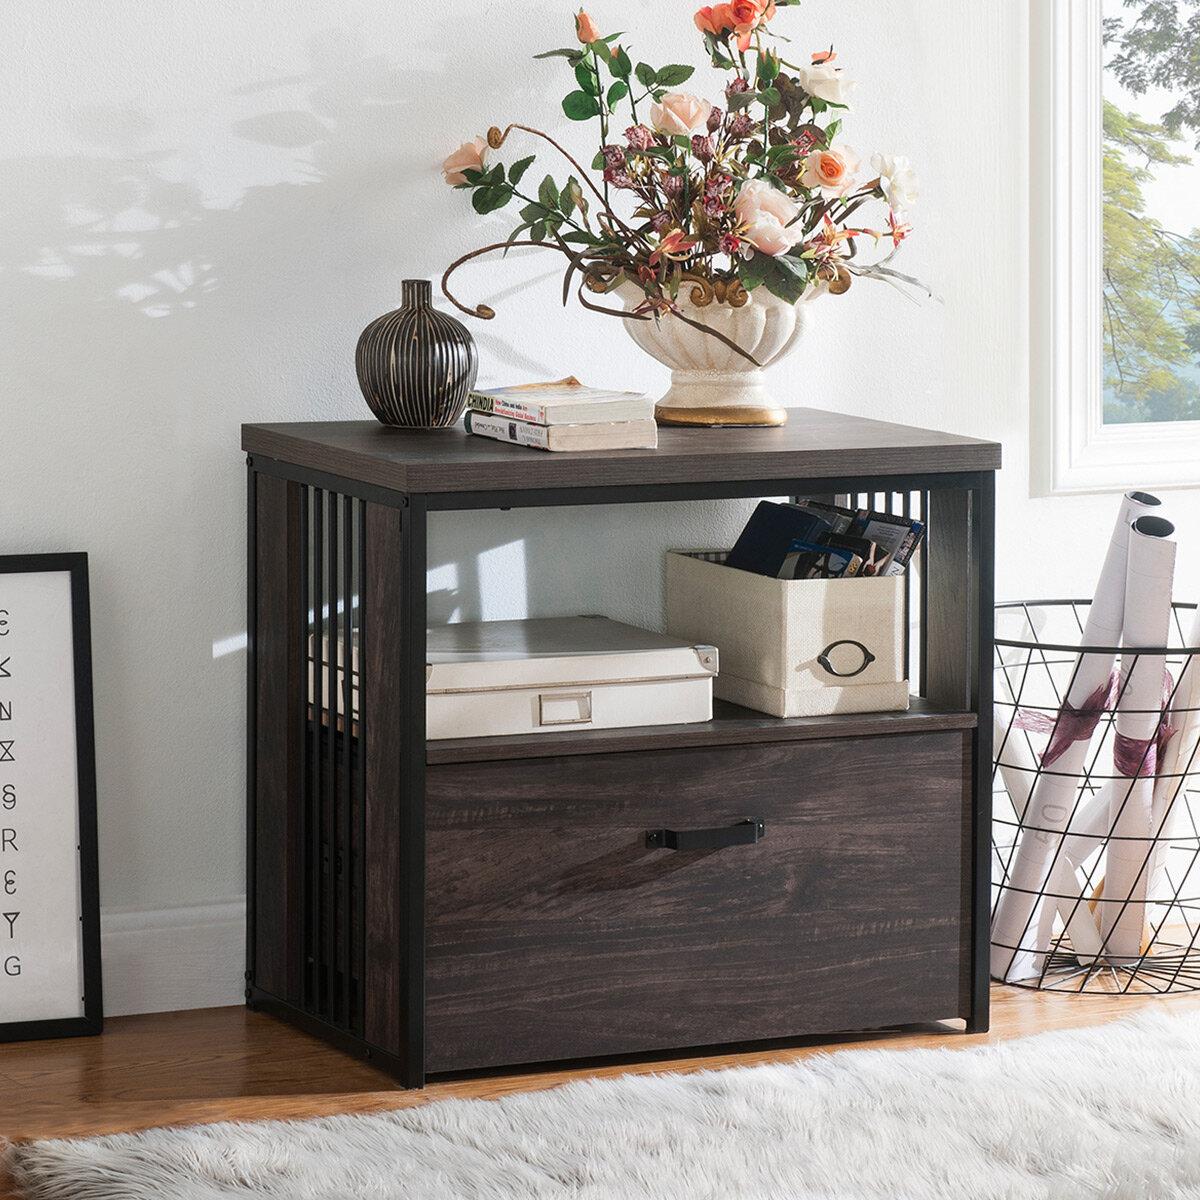 17 Stories Tekamah Home Office 1 Drawer Lateral Filing Cabinet Wayfair